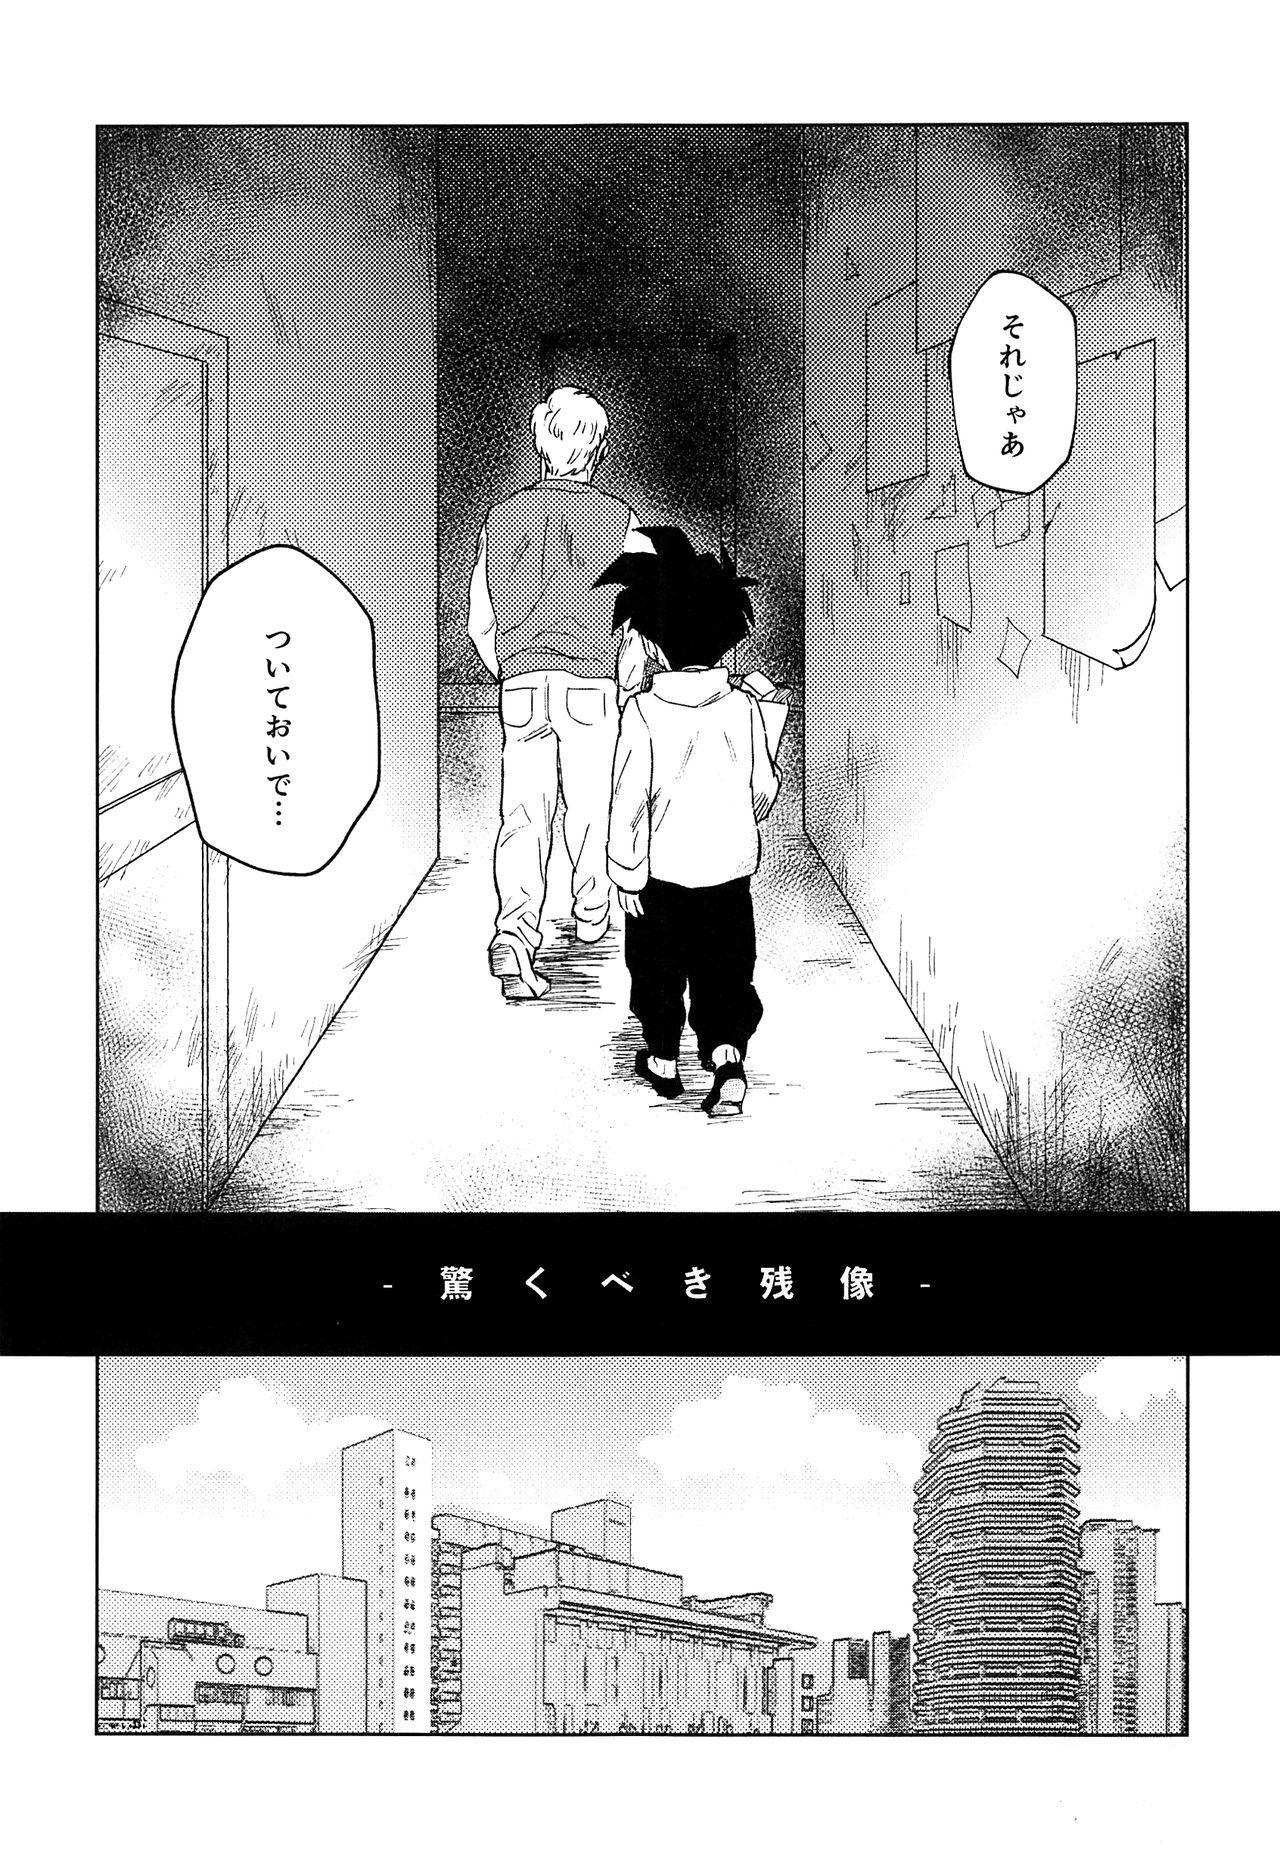 Odorokubeki Zanzou - WONDER BLUR 3